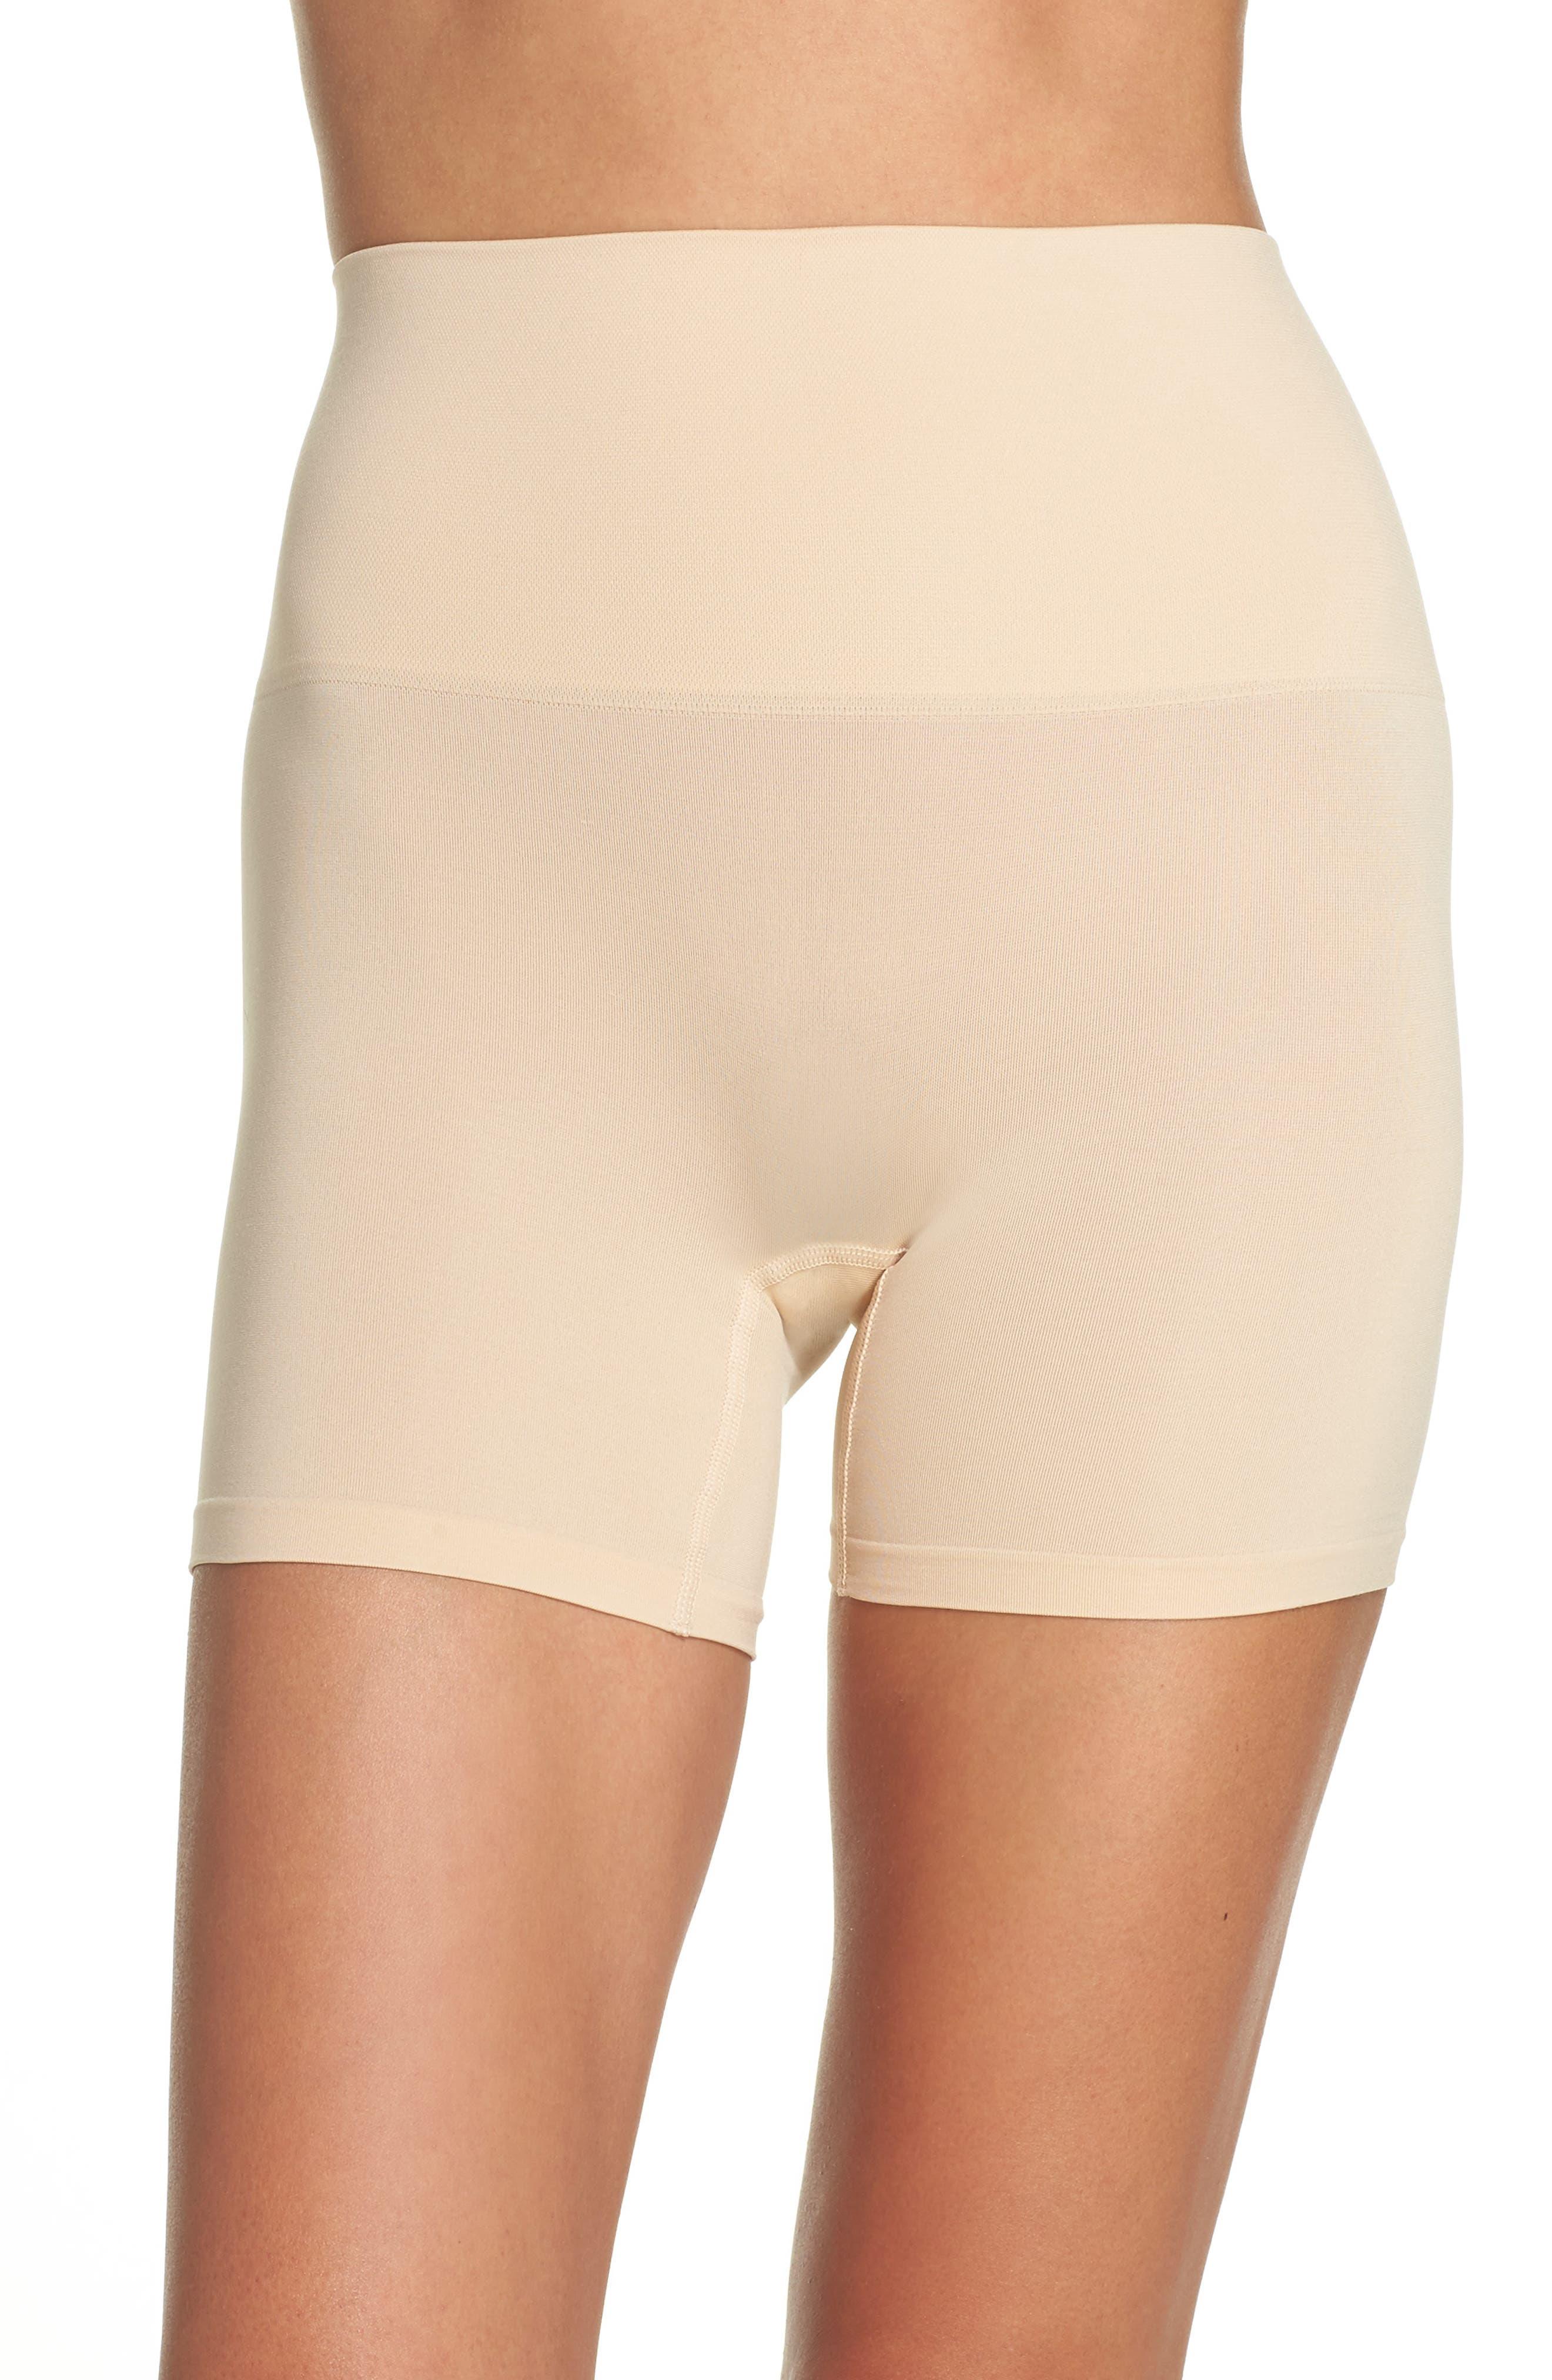 Ultralight Seamless Shaping Shorts,                             Main thumbnail 1, color,                             Frappe